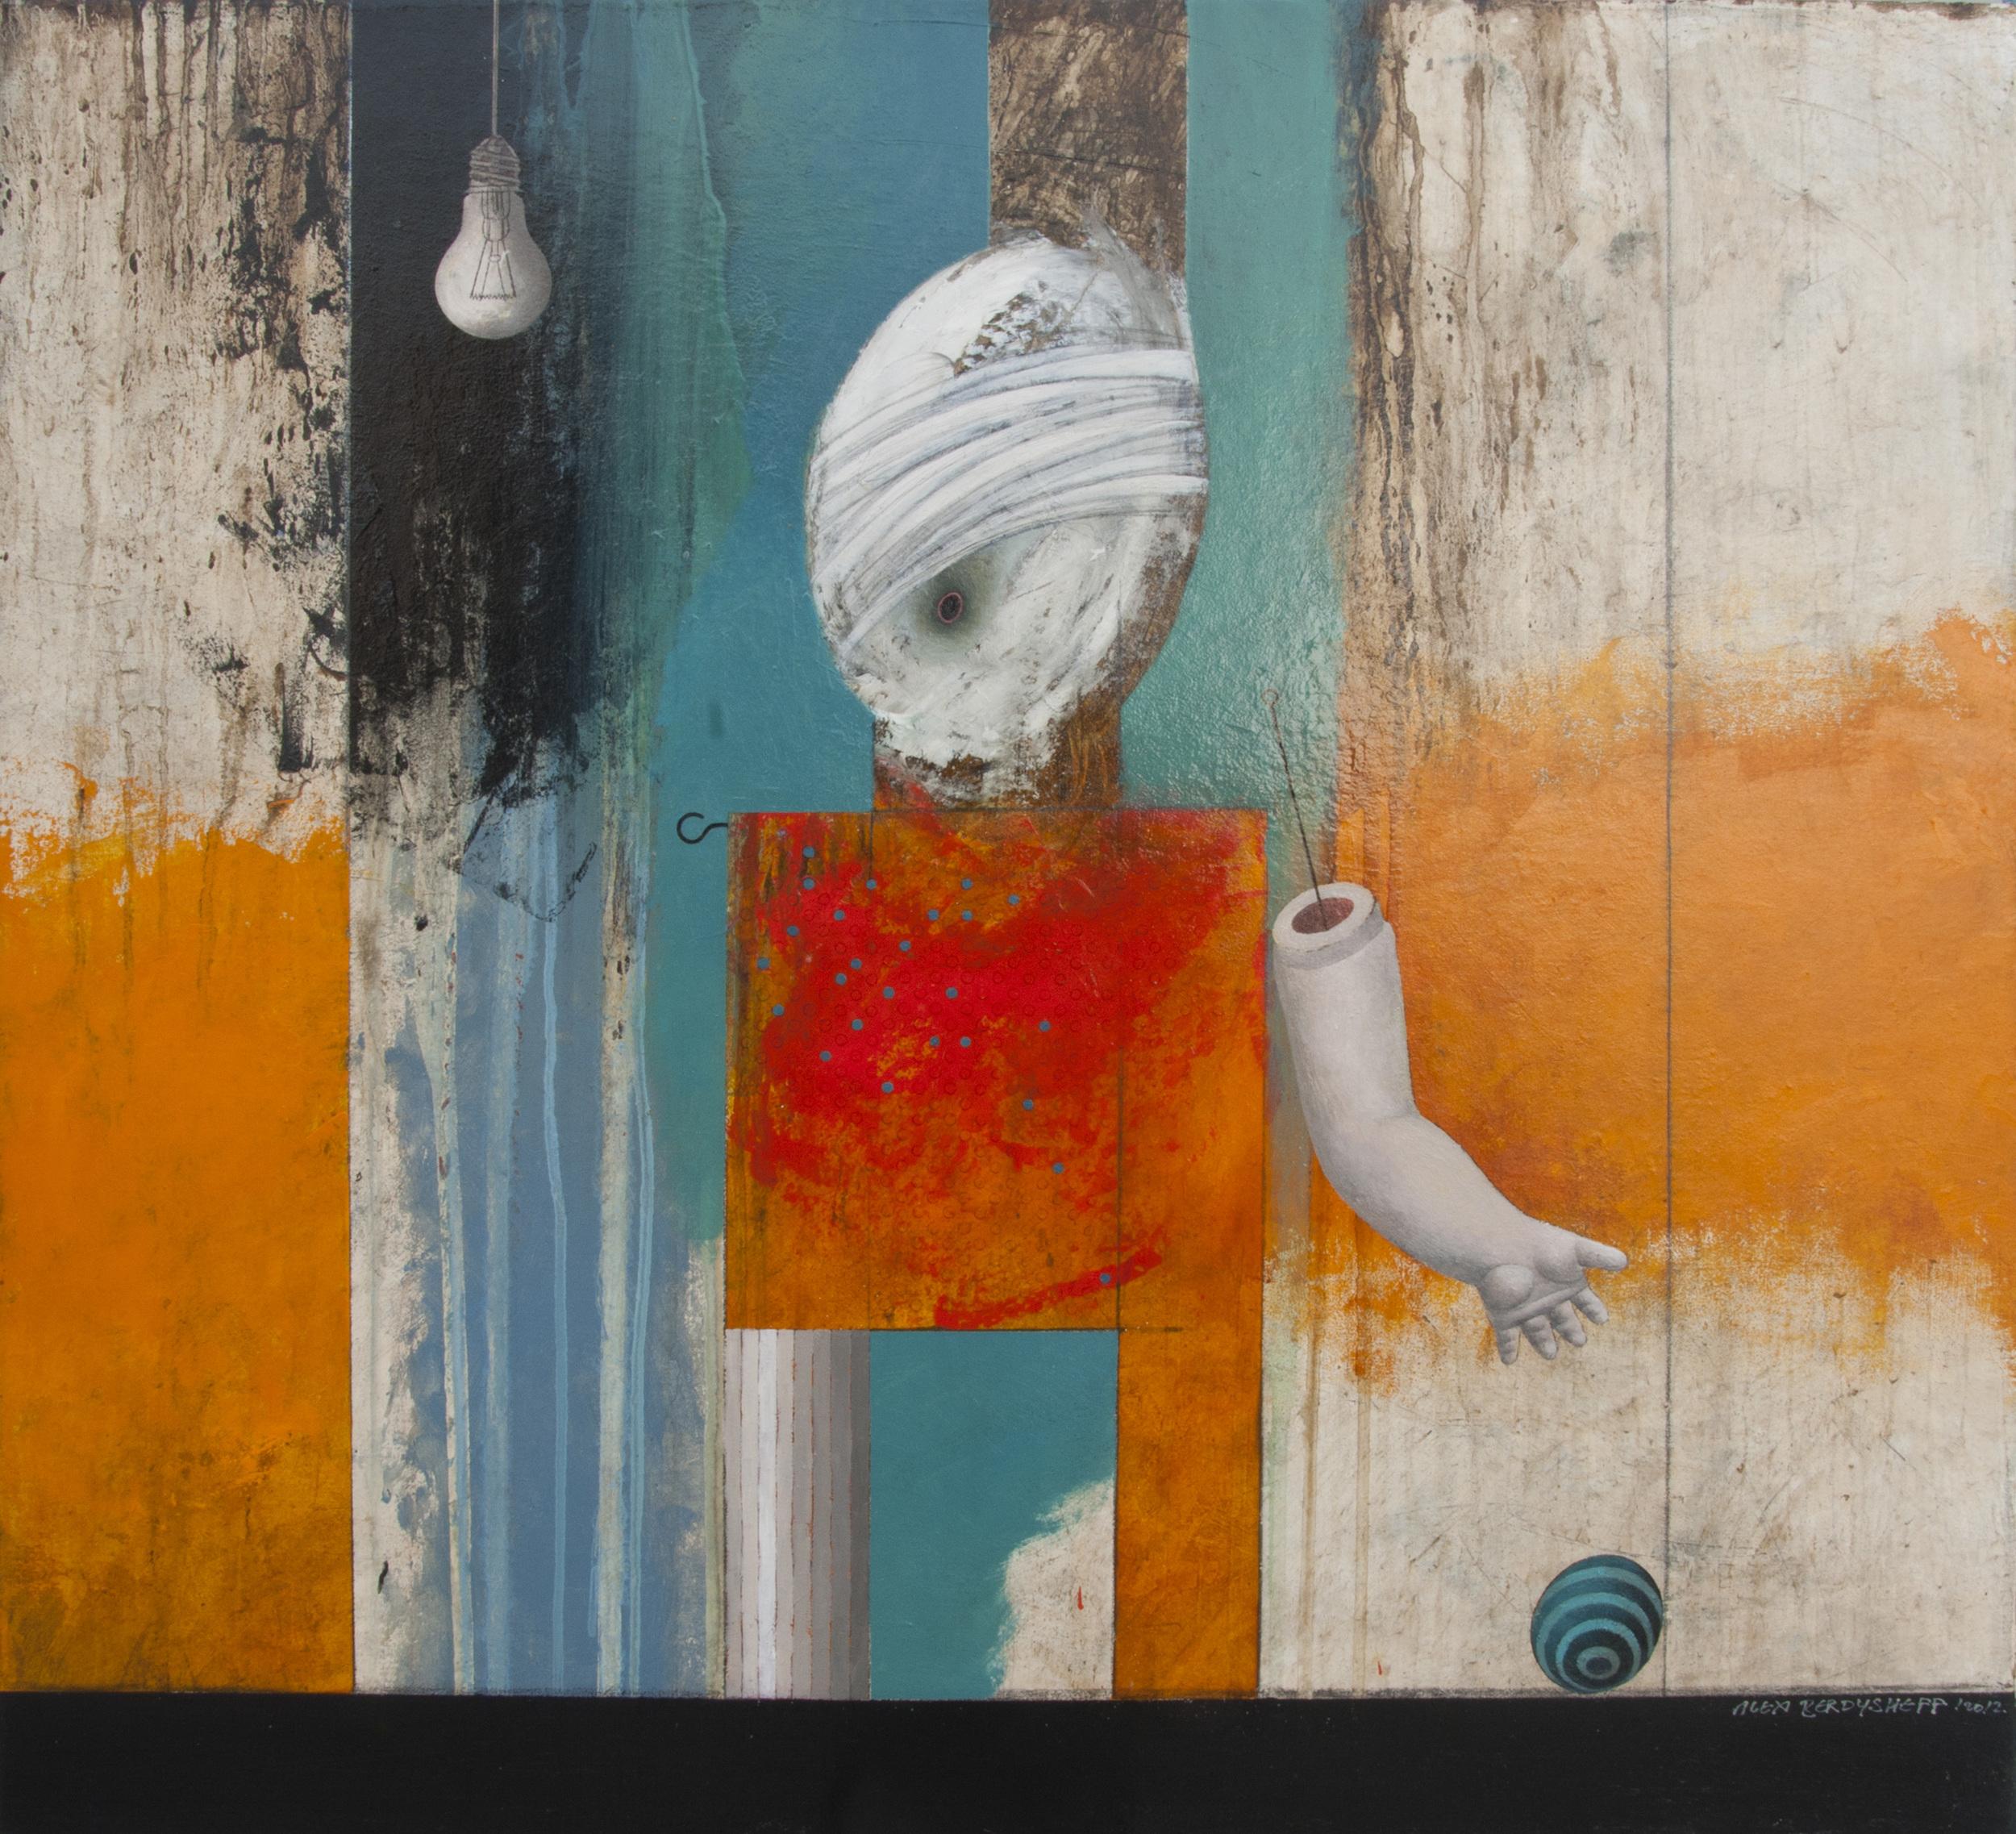 Doll, oil on canvas, 72x78 cm, 2012